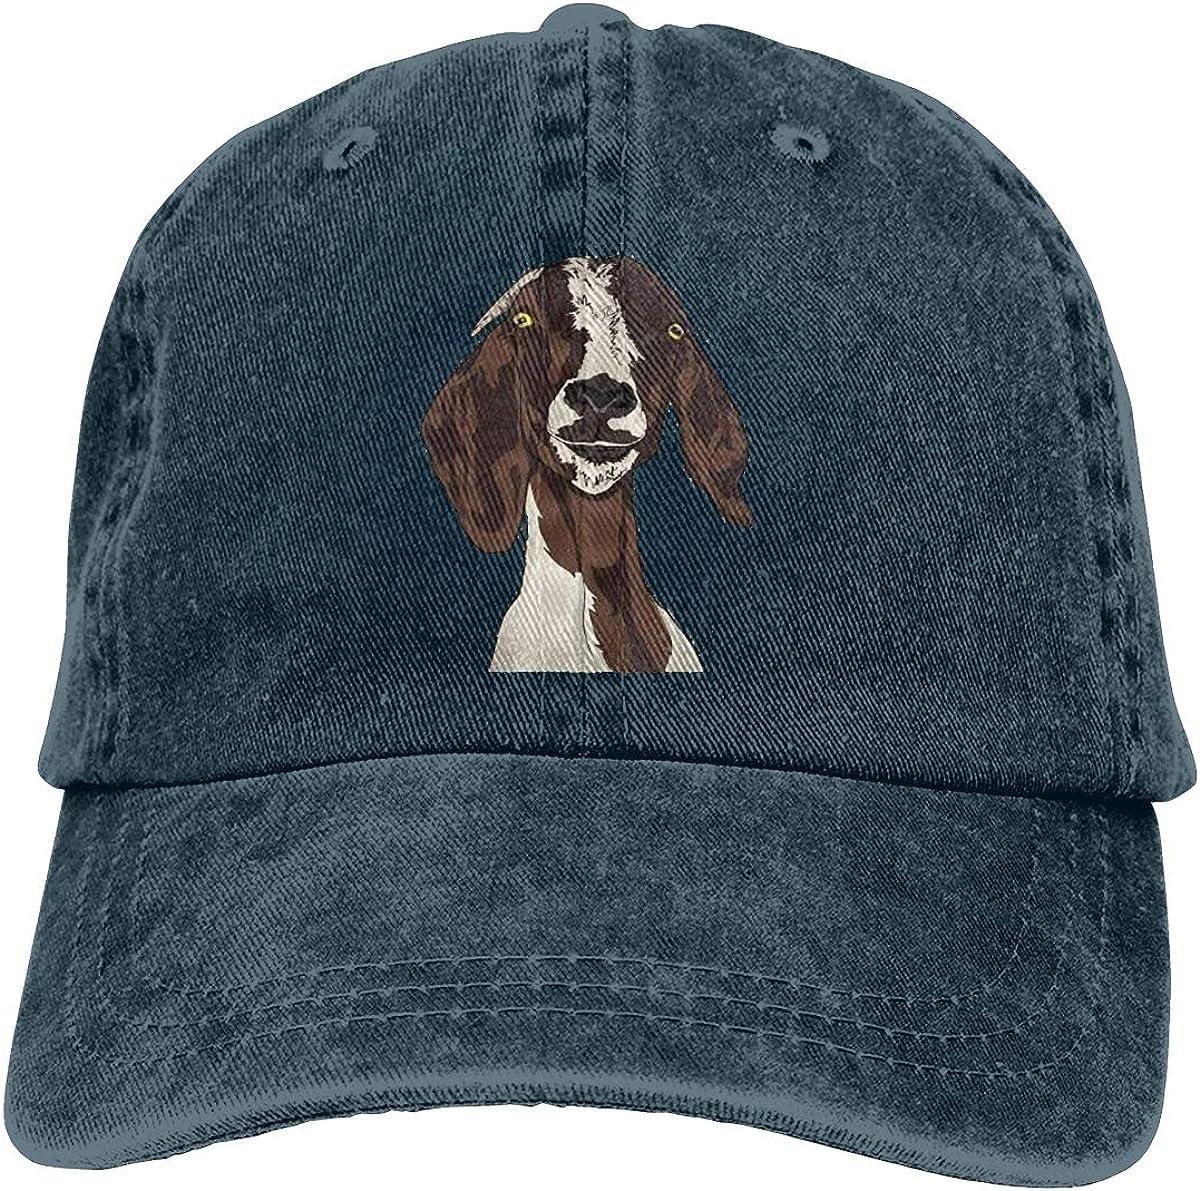 Goat Unisex Baseball Cap Cotton Denim Amazing Adjustable Sun Hat for Men Women Youth